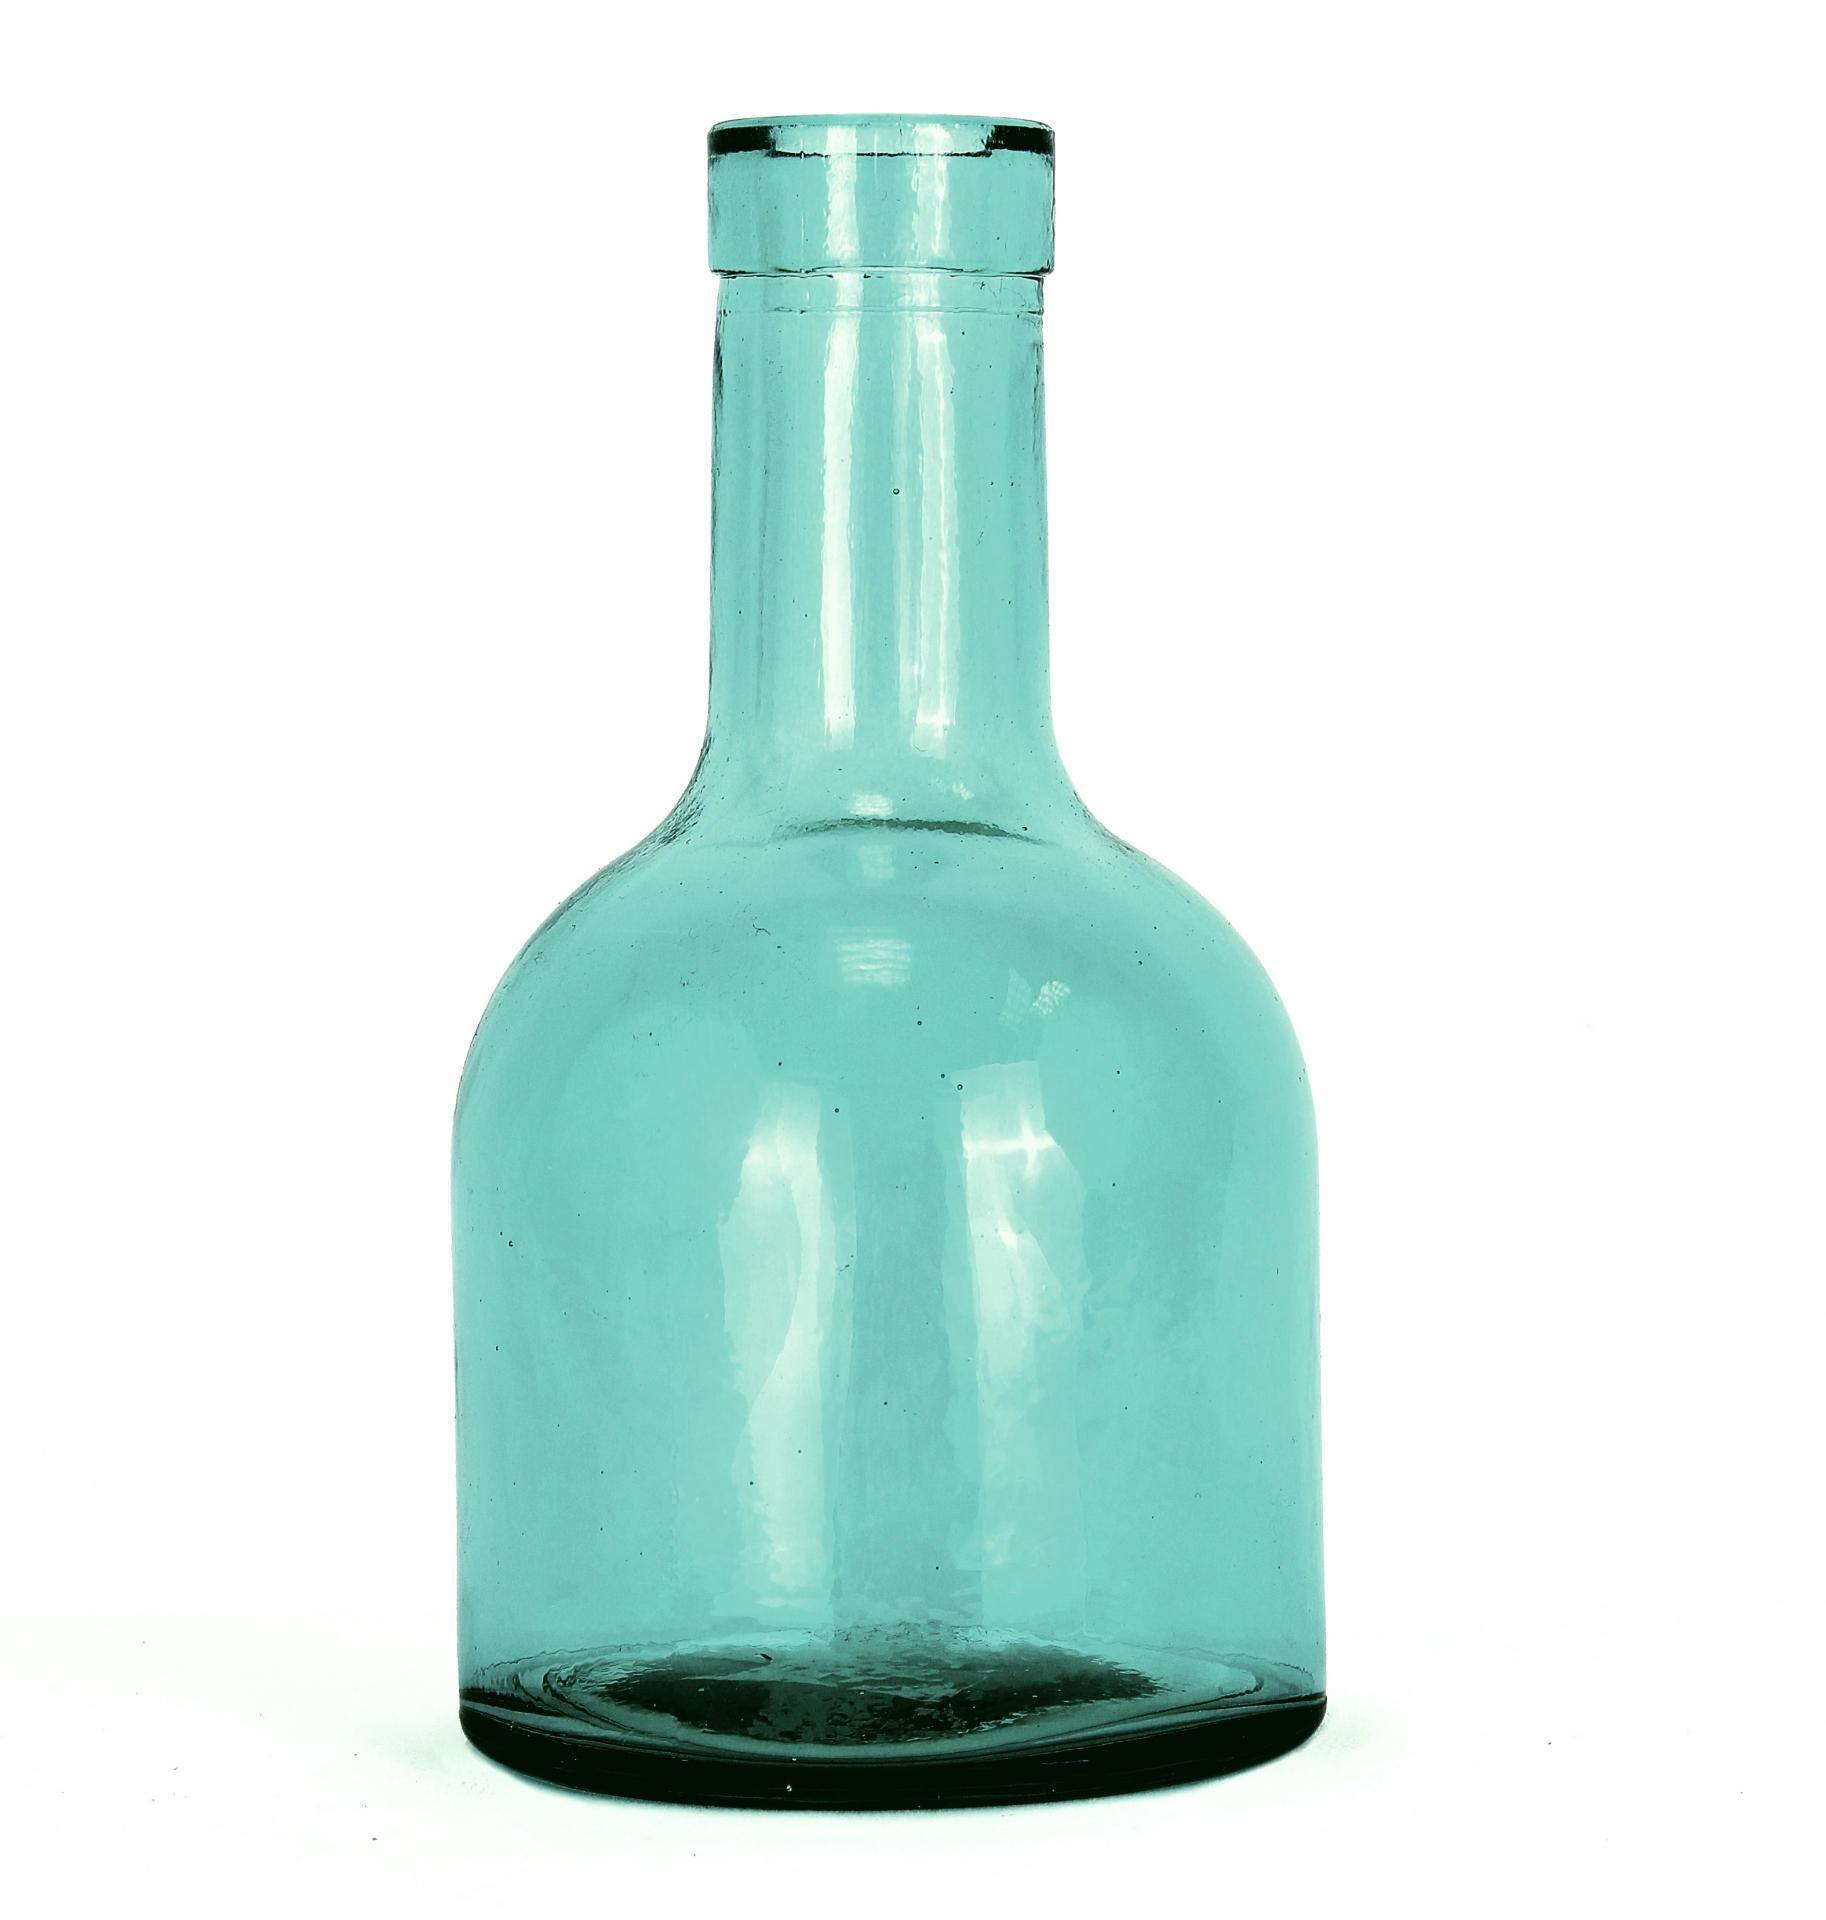 Skleněná vázička Aqua, modrá barva, sklo